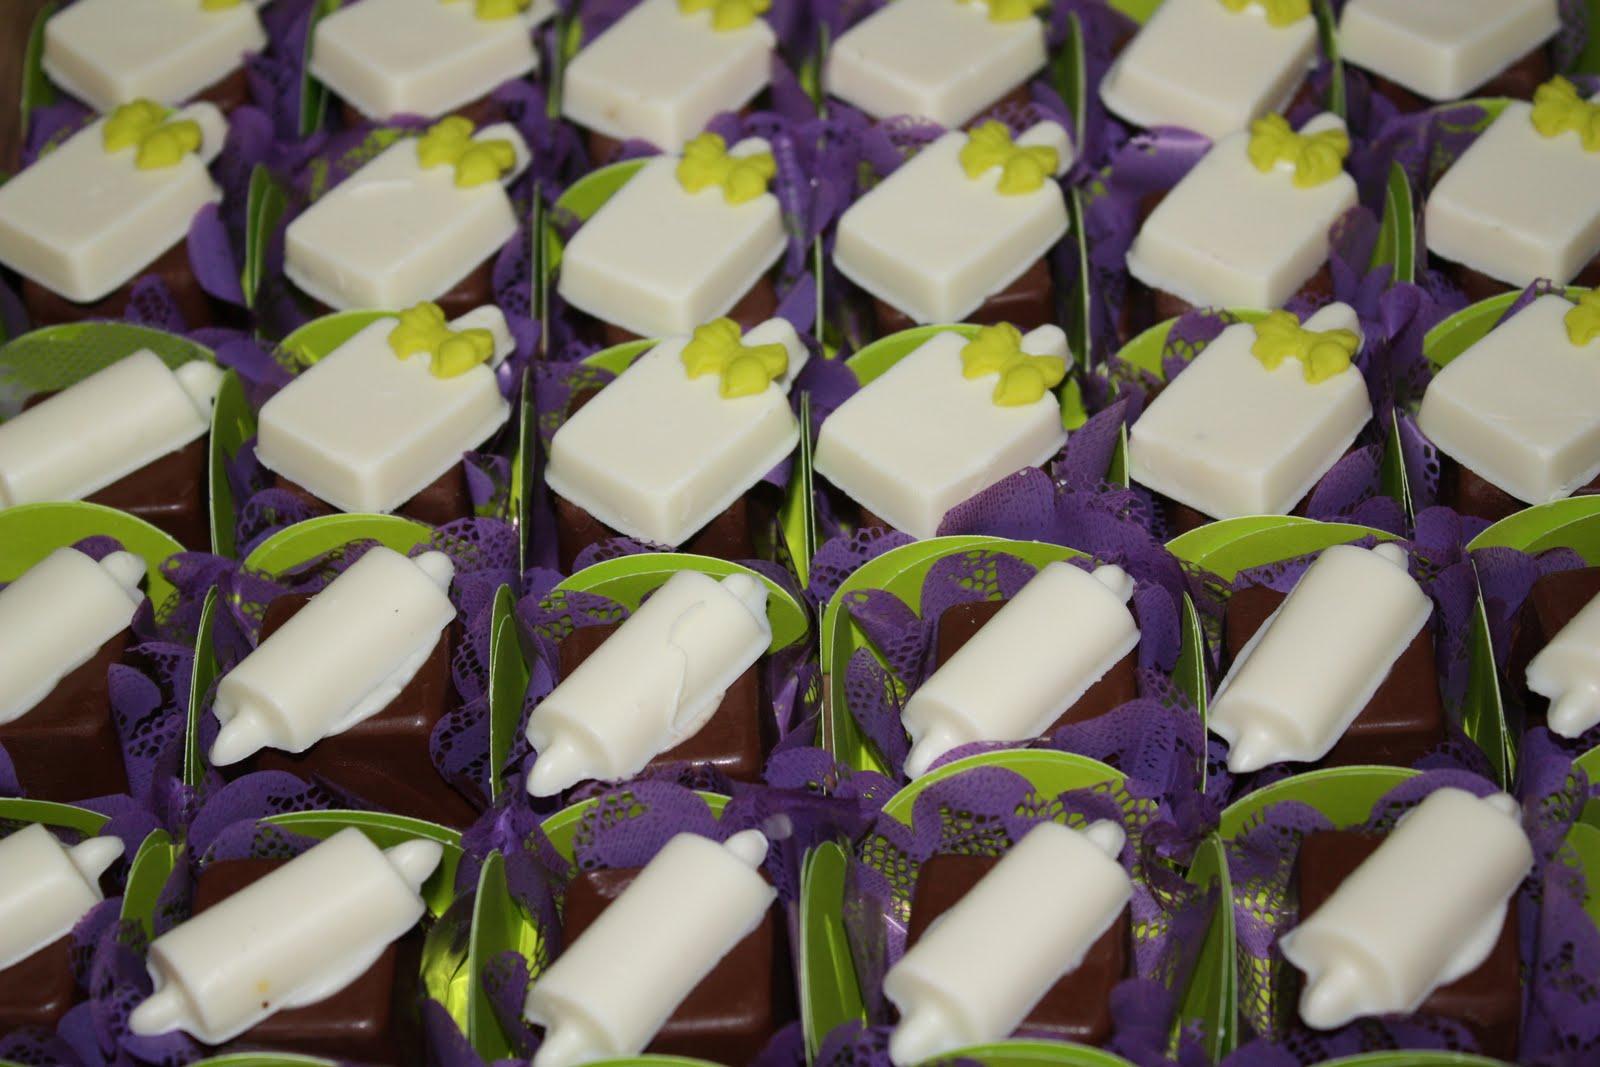 Michelle Lecce Bolos Doces e Chocolates: Bombom e Cupcake Chá  #9F9F2C 1600 1067